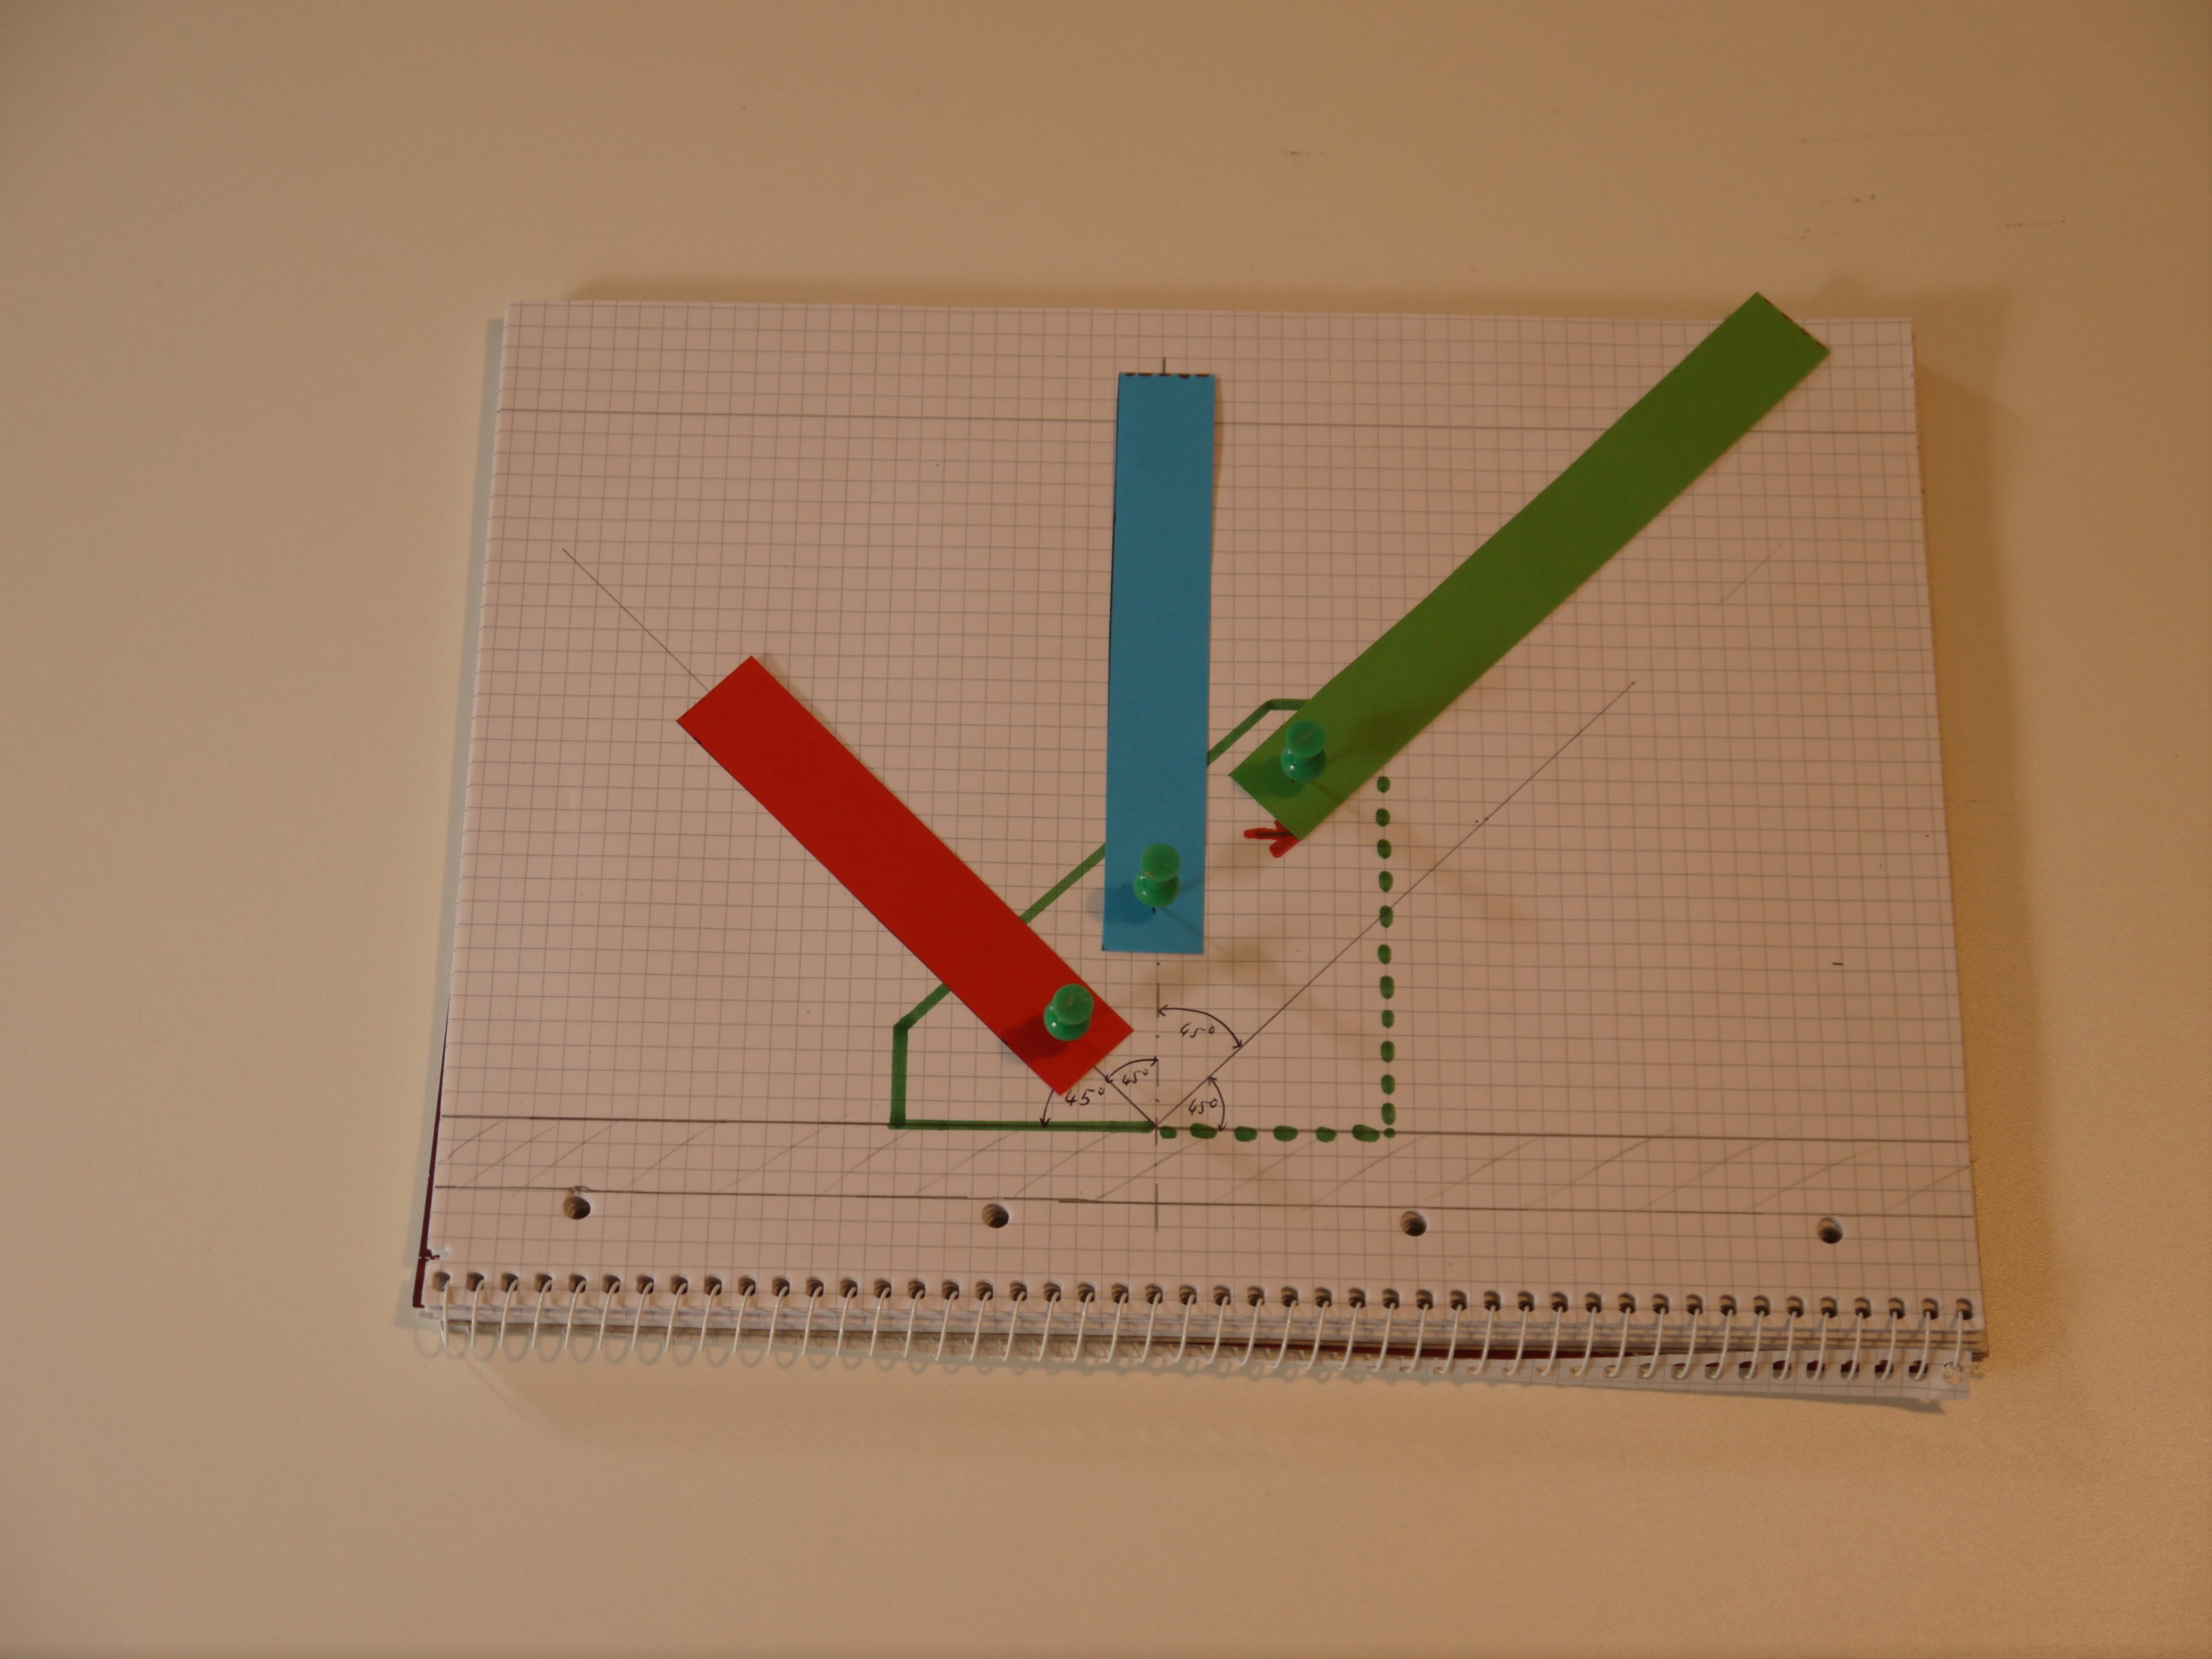 Fertiges Modell Klappmechanismus selbser gebautes Dachzelt